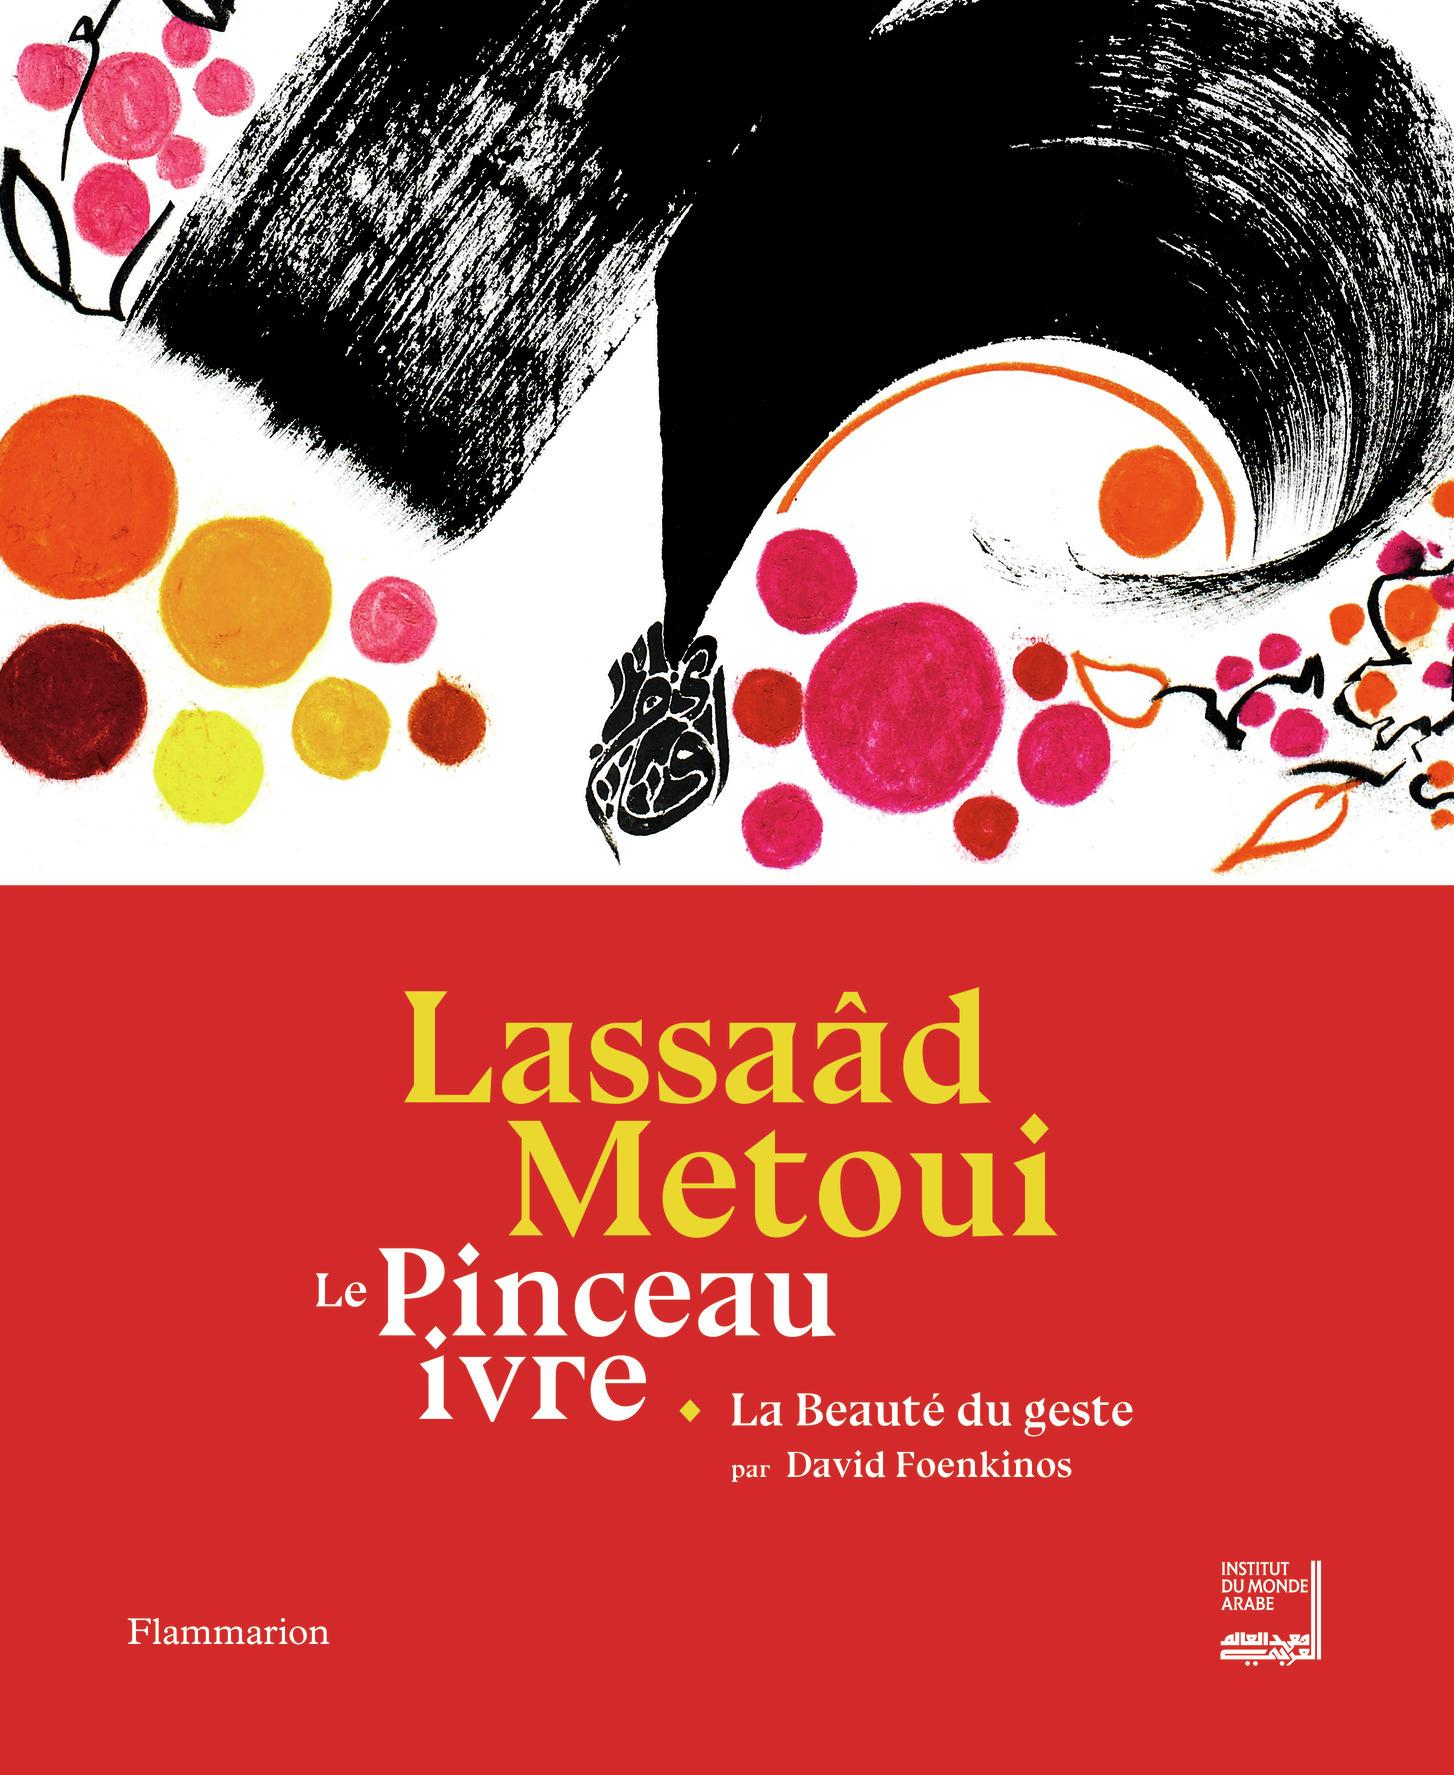 LASSAAD METOUI - LE PINCEAU IVRE